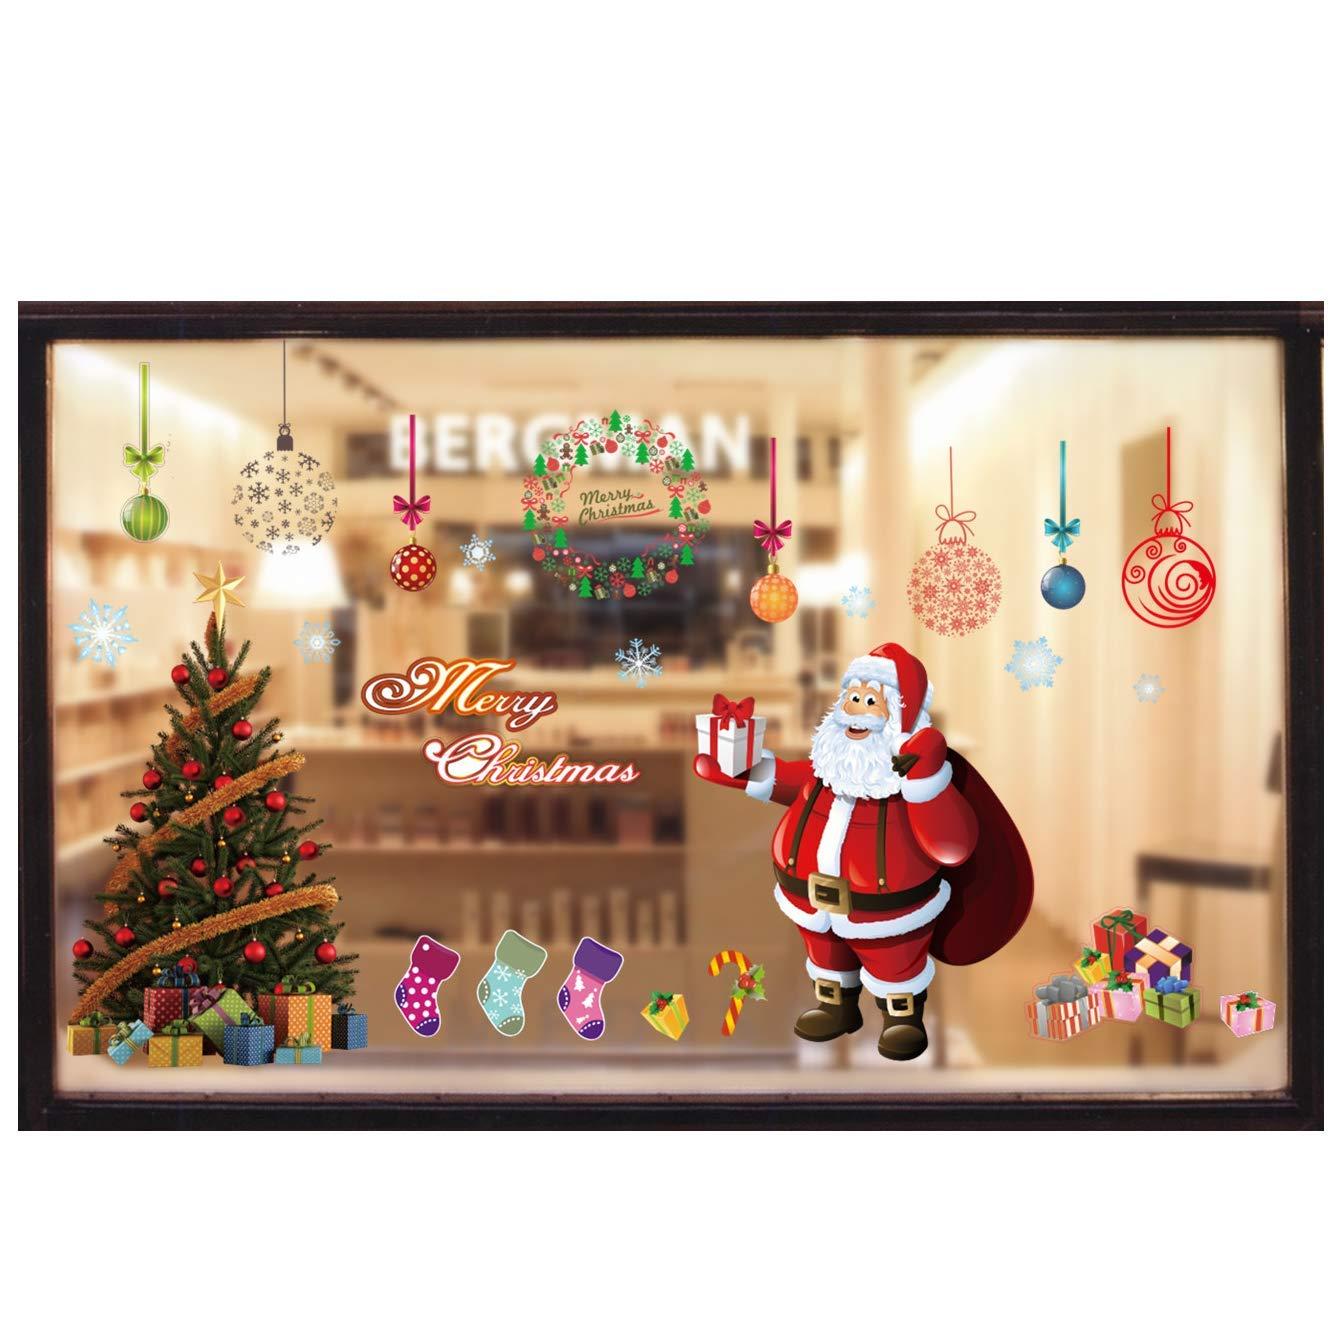 Miki&Co Pegatina Navidad Calcomanías Ventana - Santa Claus Arbol de Navidad - PVC Adhesivo para Ventanas